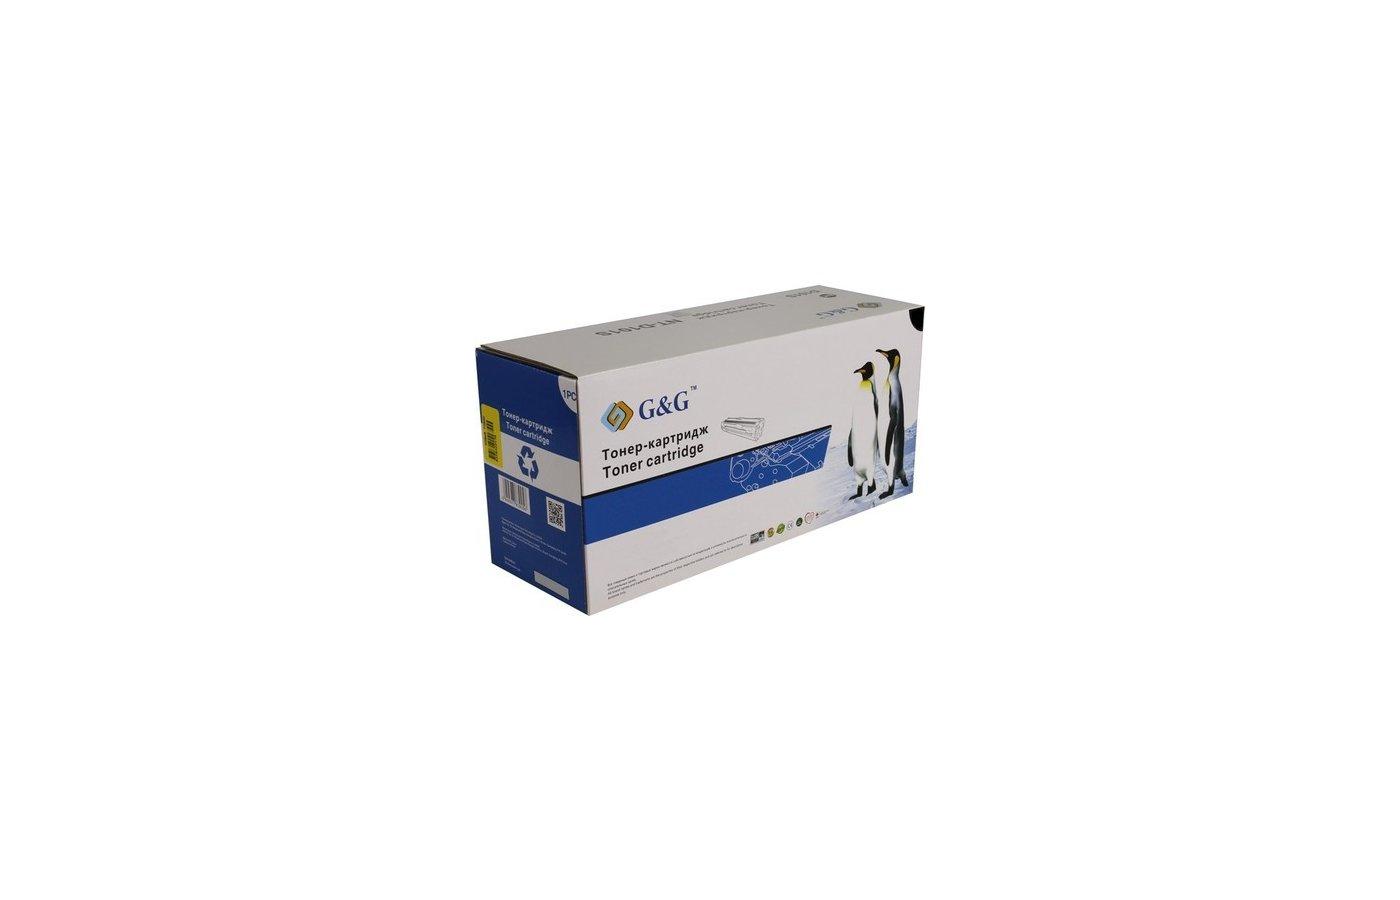 Картридж лазерный GG NT-CF281X для HP LaserJet Enterprise Flow MFP M605/606/630 (25000стр)